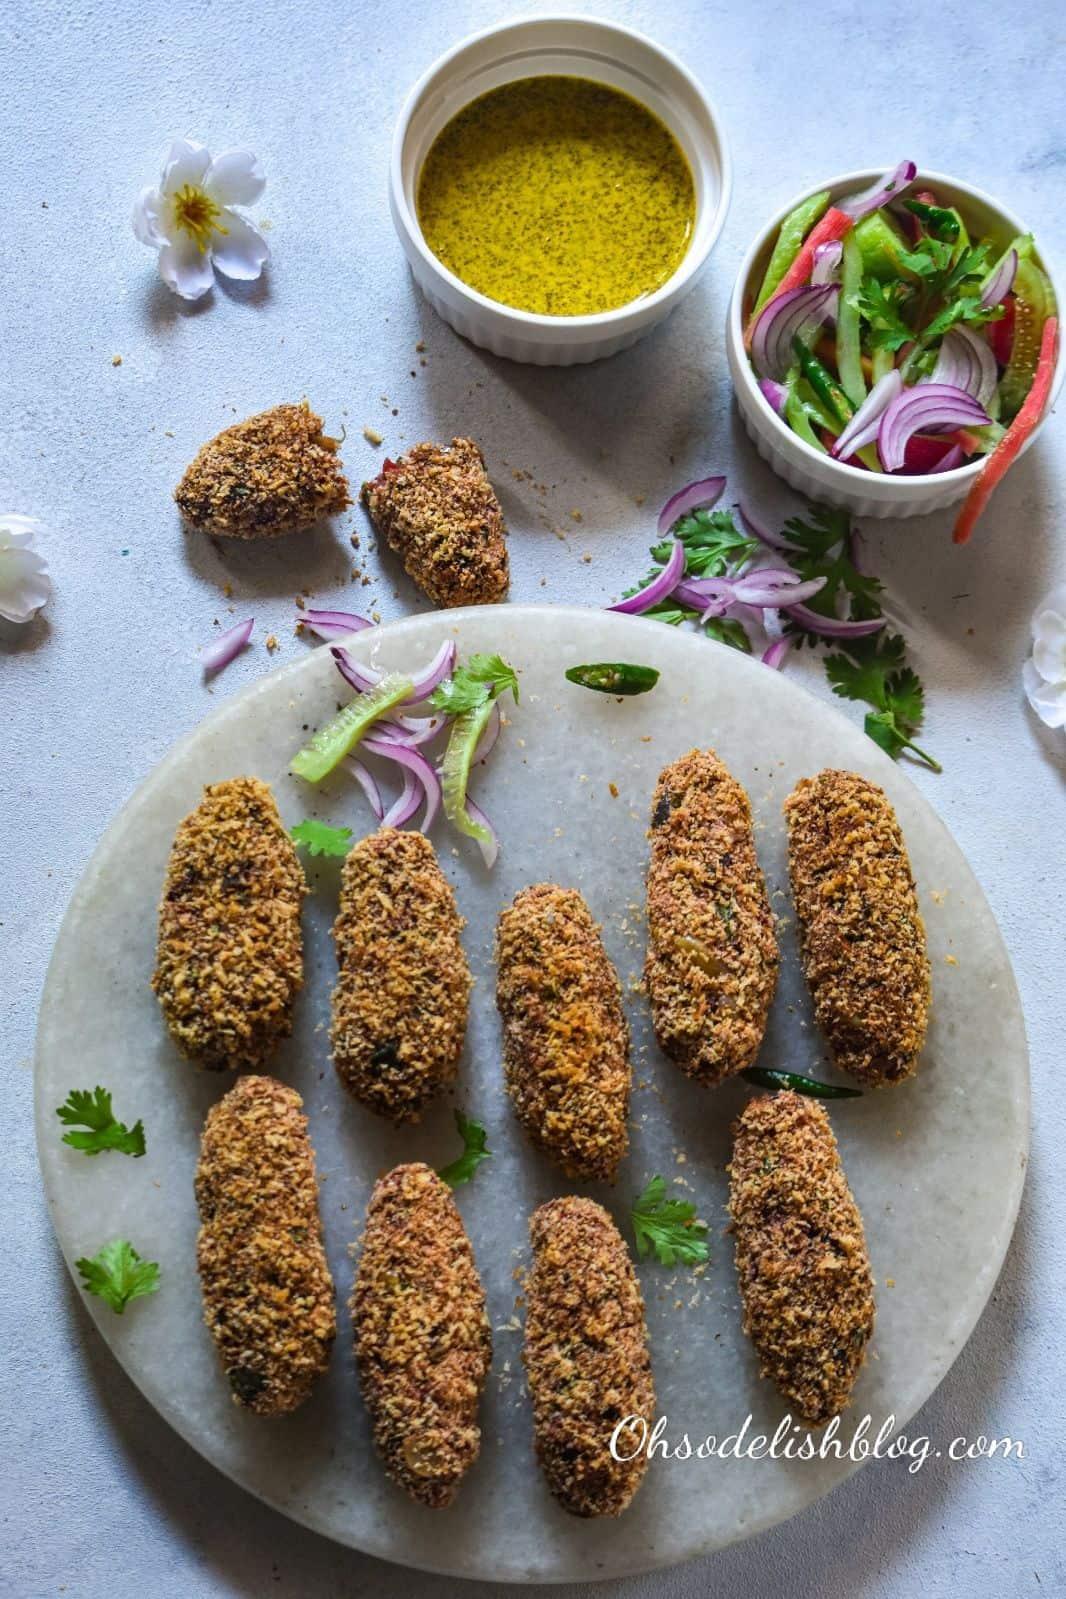 baked vegetable chop (kolkata style)